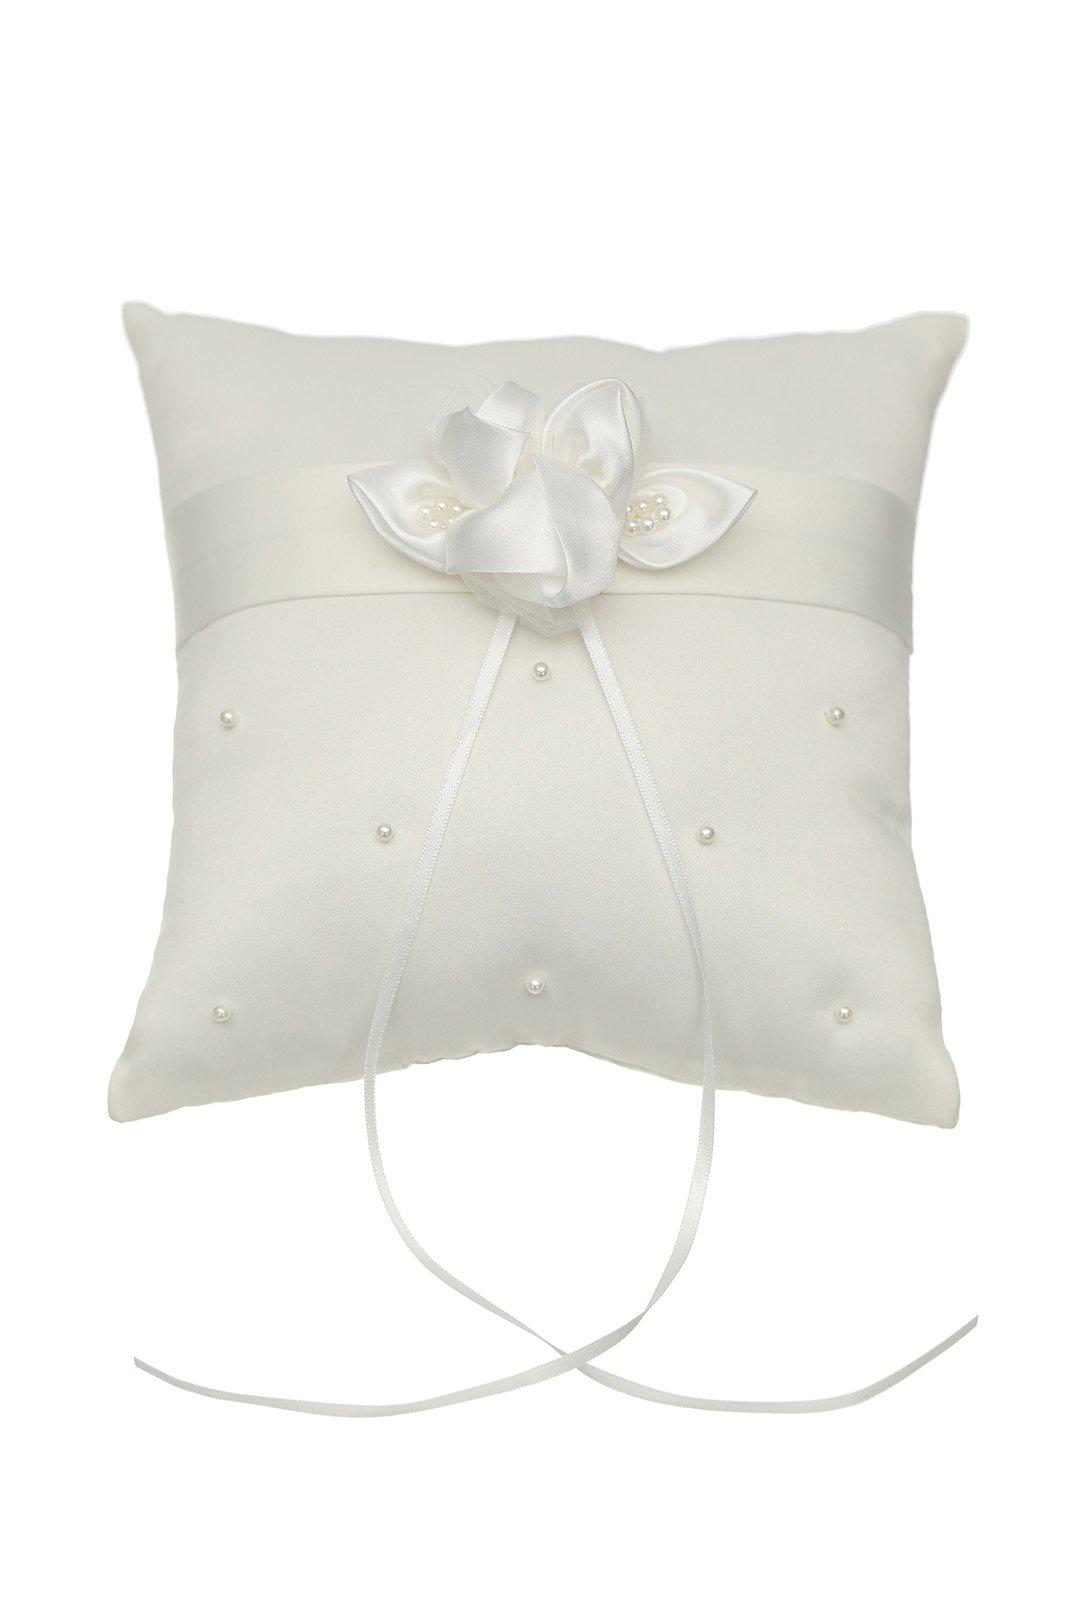 SAMKY Venus Jewelry Rosette Flower Pearls Studded Wedding Ring Bearer Pillow 7 Inch x 7 Inch - Ivory RP005I